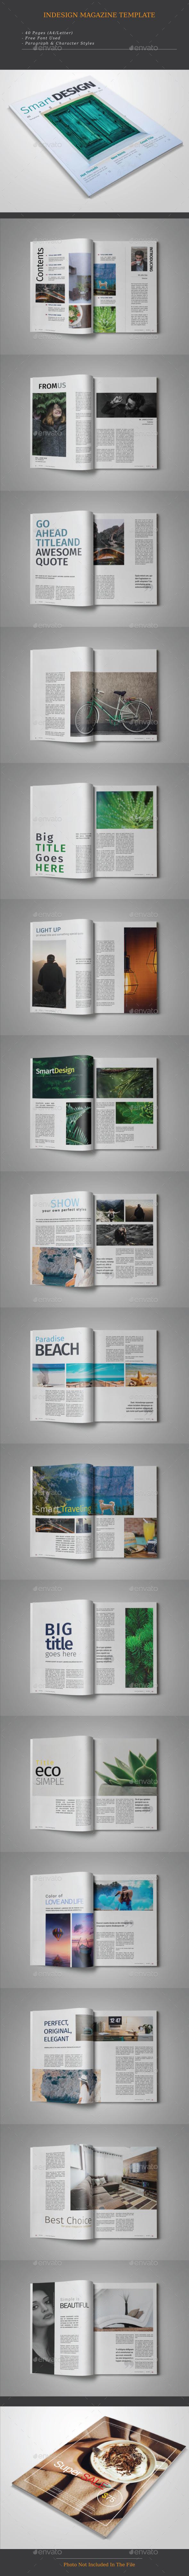 Smart Design Magazine - Magazines Print Templates